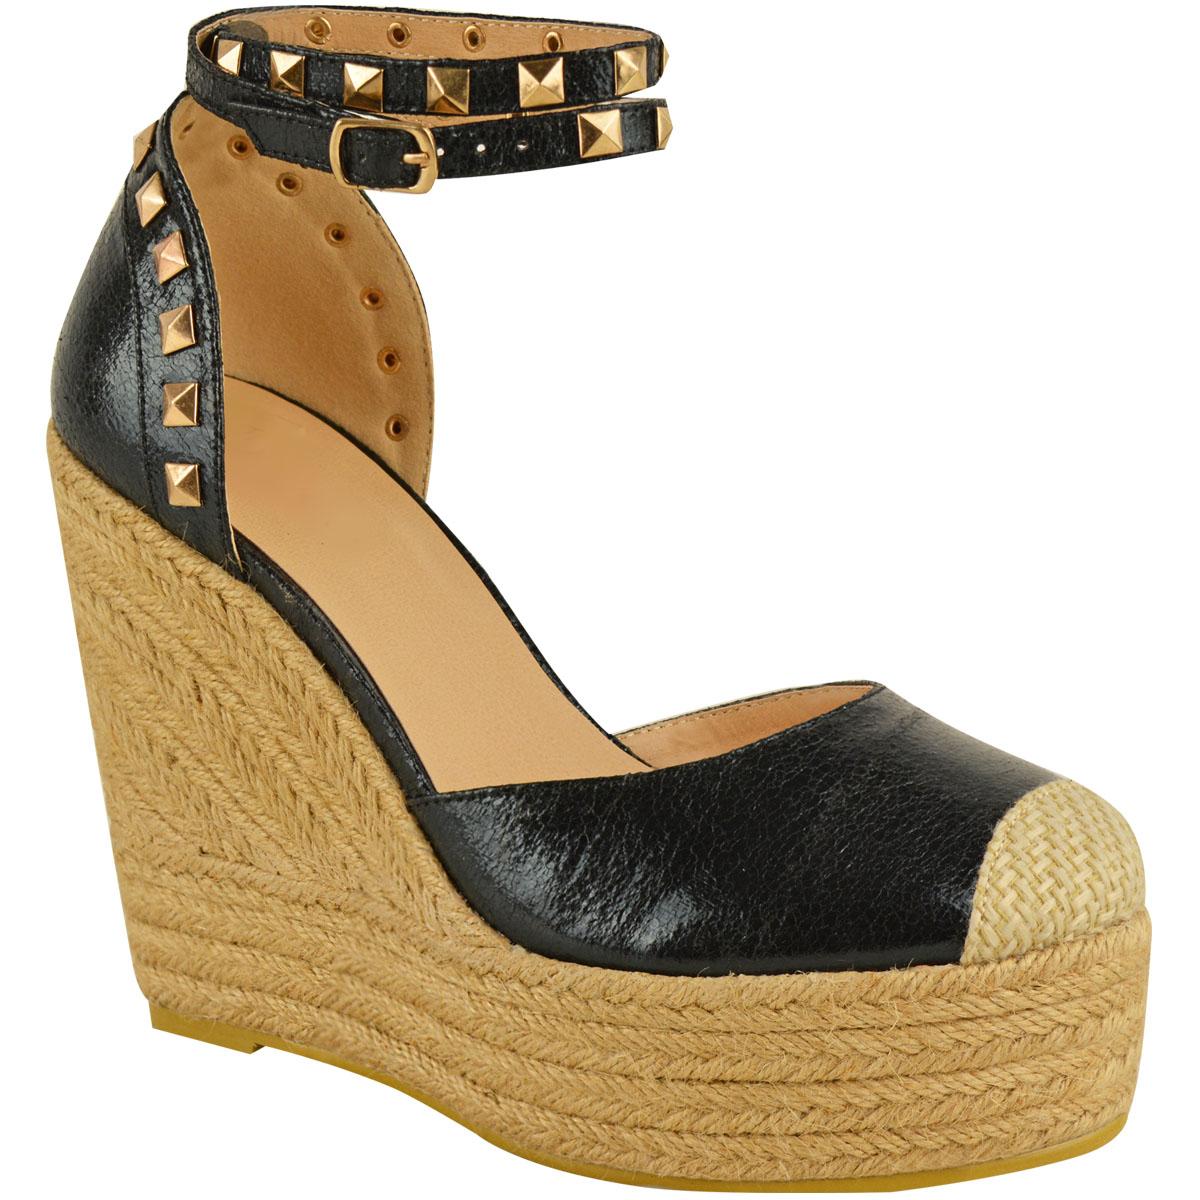 New Womens Stud Espadrille Wedge Summer Sandal Ladies Rose ...